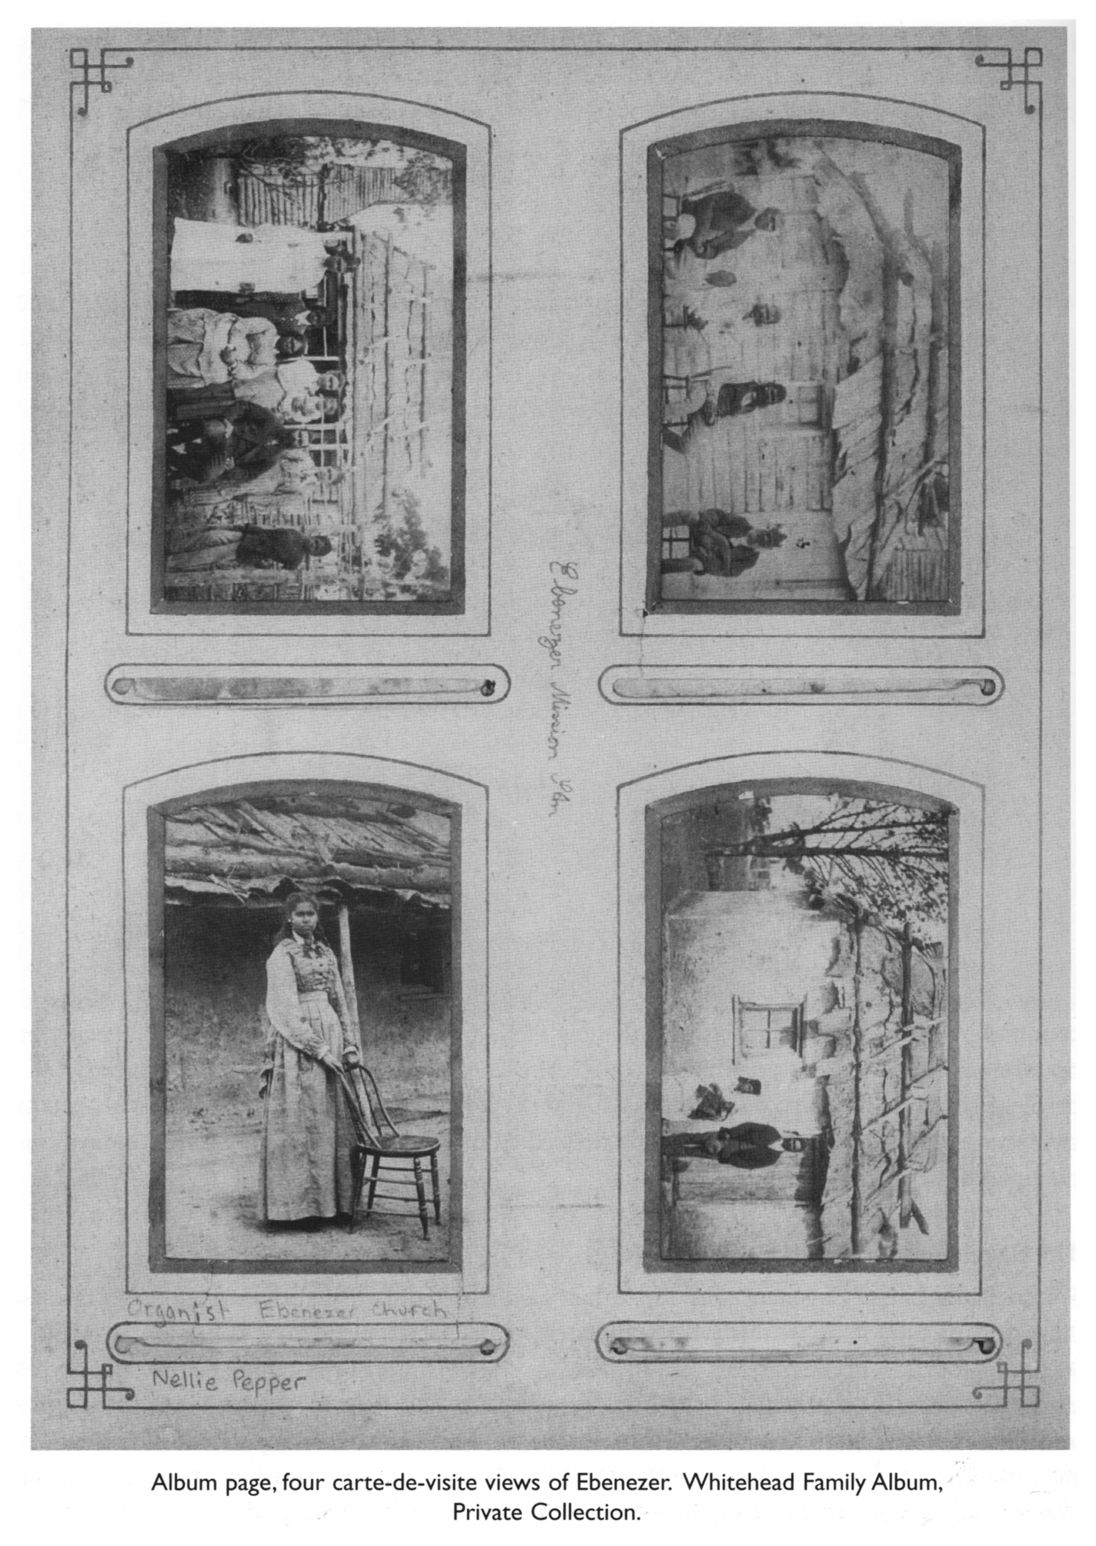 Album Page Four Carte De Visite Views Of Ebenezer Whitehead Family